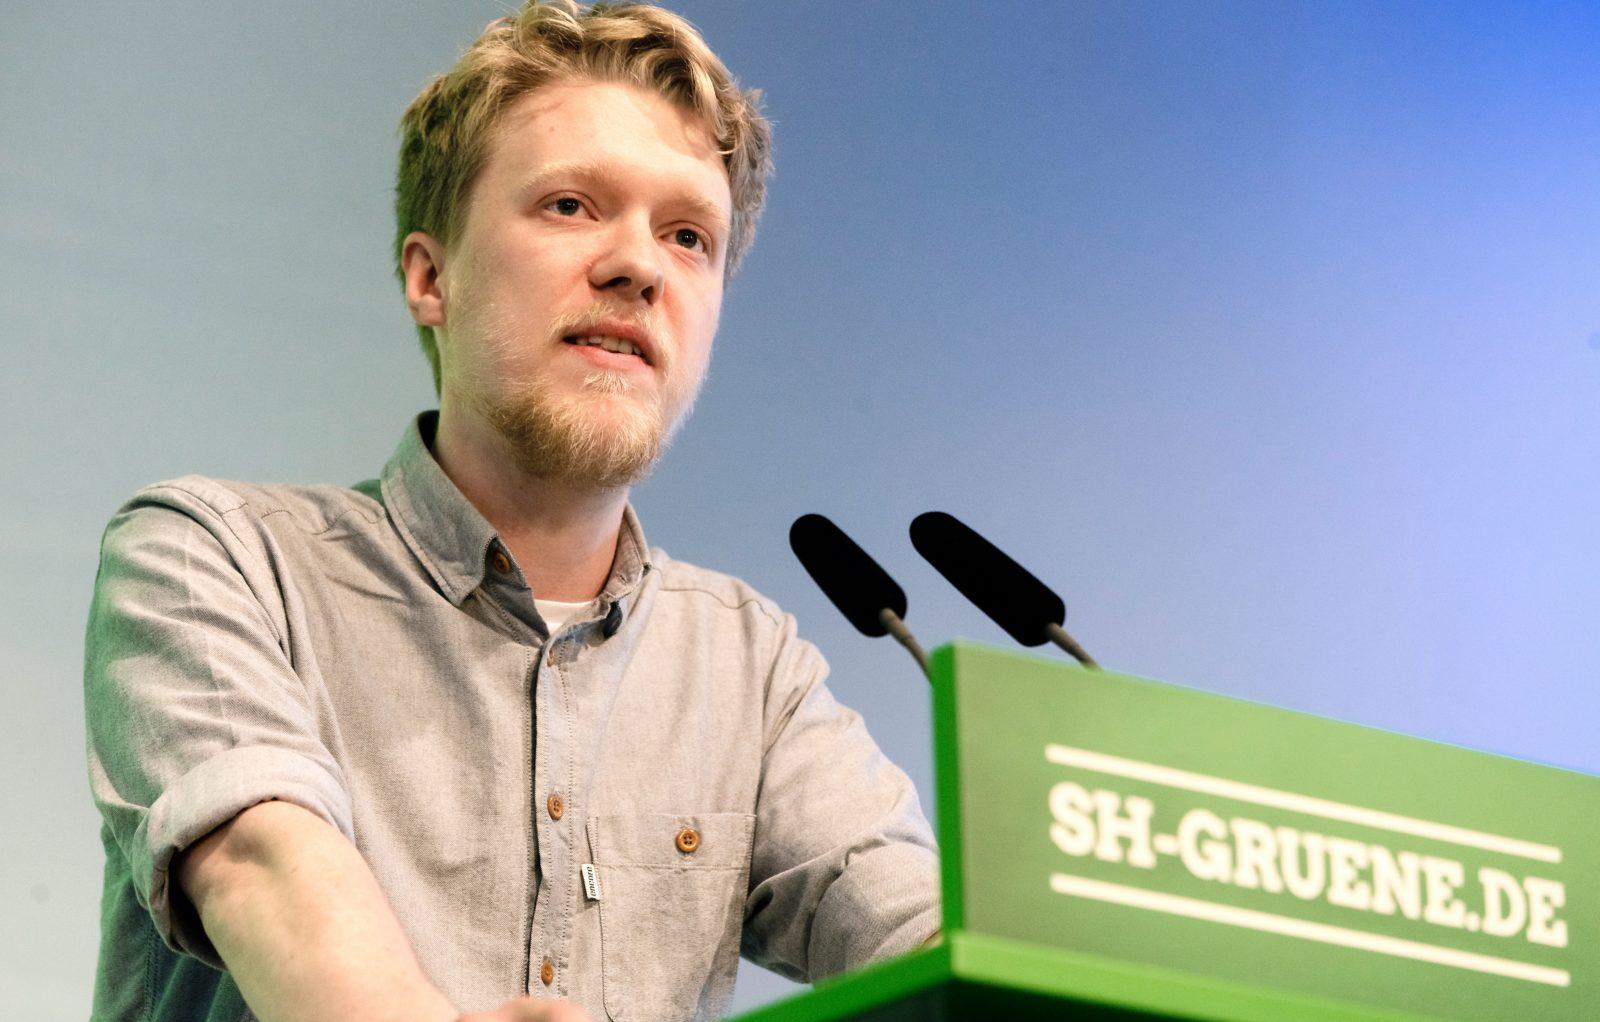 Finanzpolitischer Sprecher der Grünen-Fraktion, Lasse Petersdotter